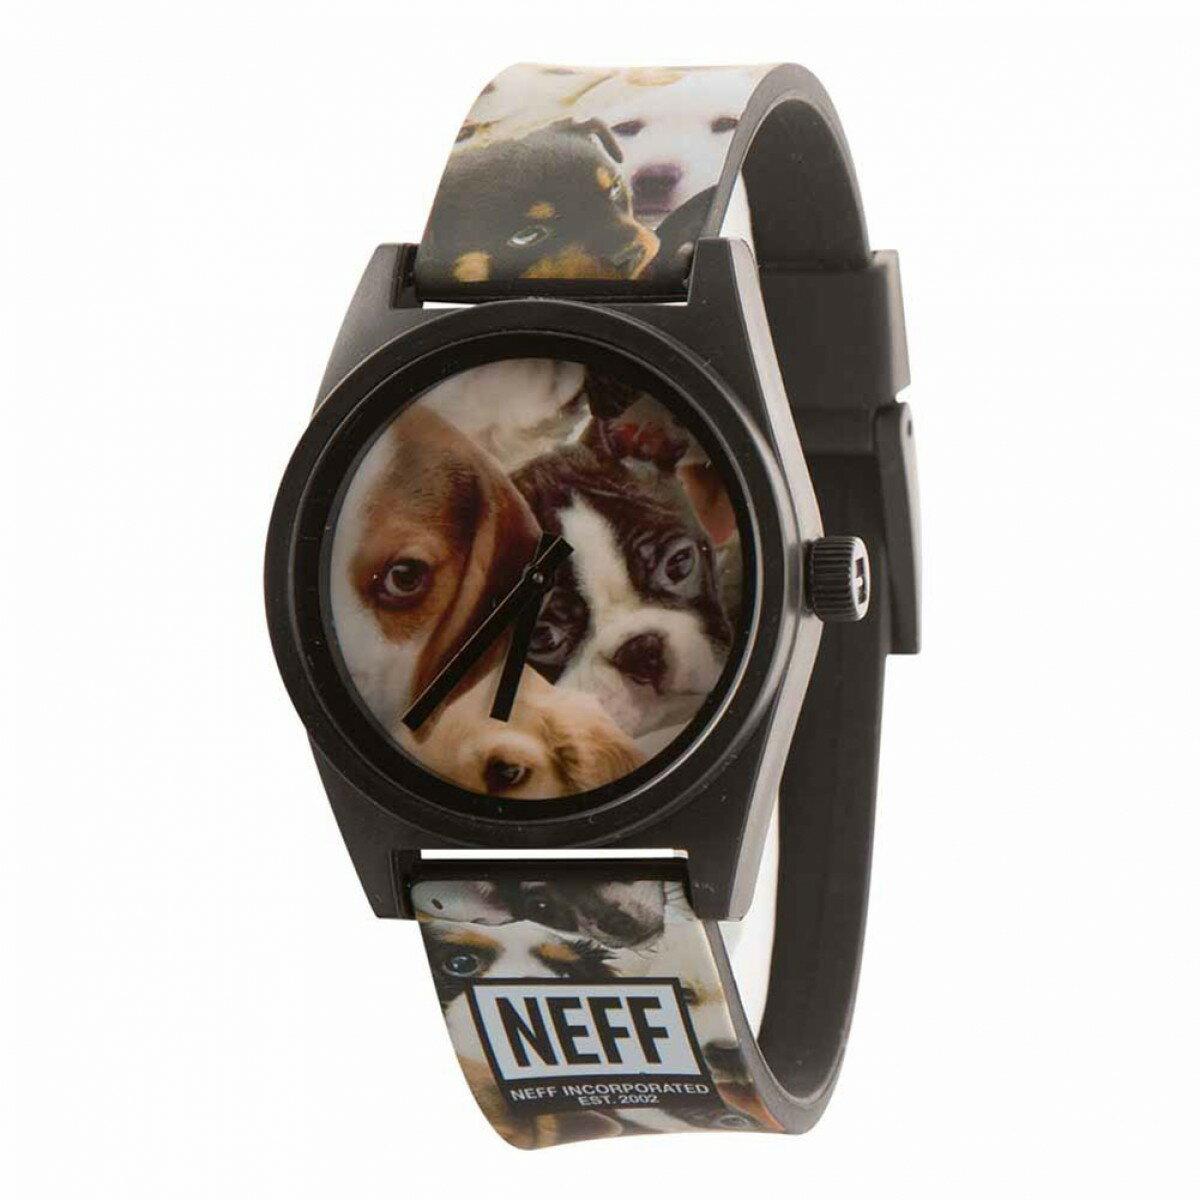 BEETLE NEEF DAILY WILD WATCH 狗狗 滿版 黑色 指針錶 手錶 圓錶 防水 - 限時優惠好康折扣